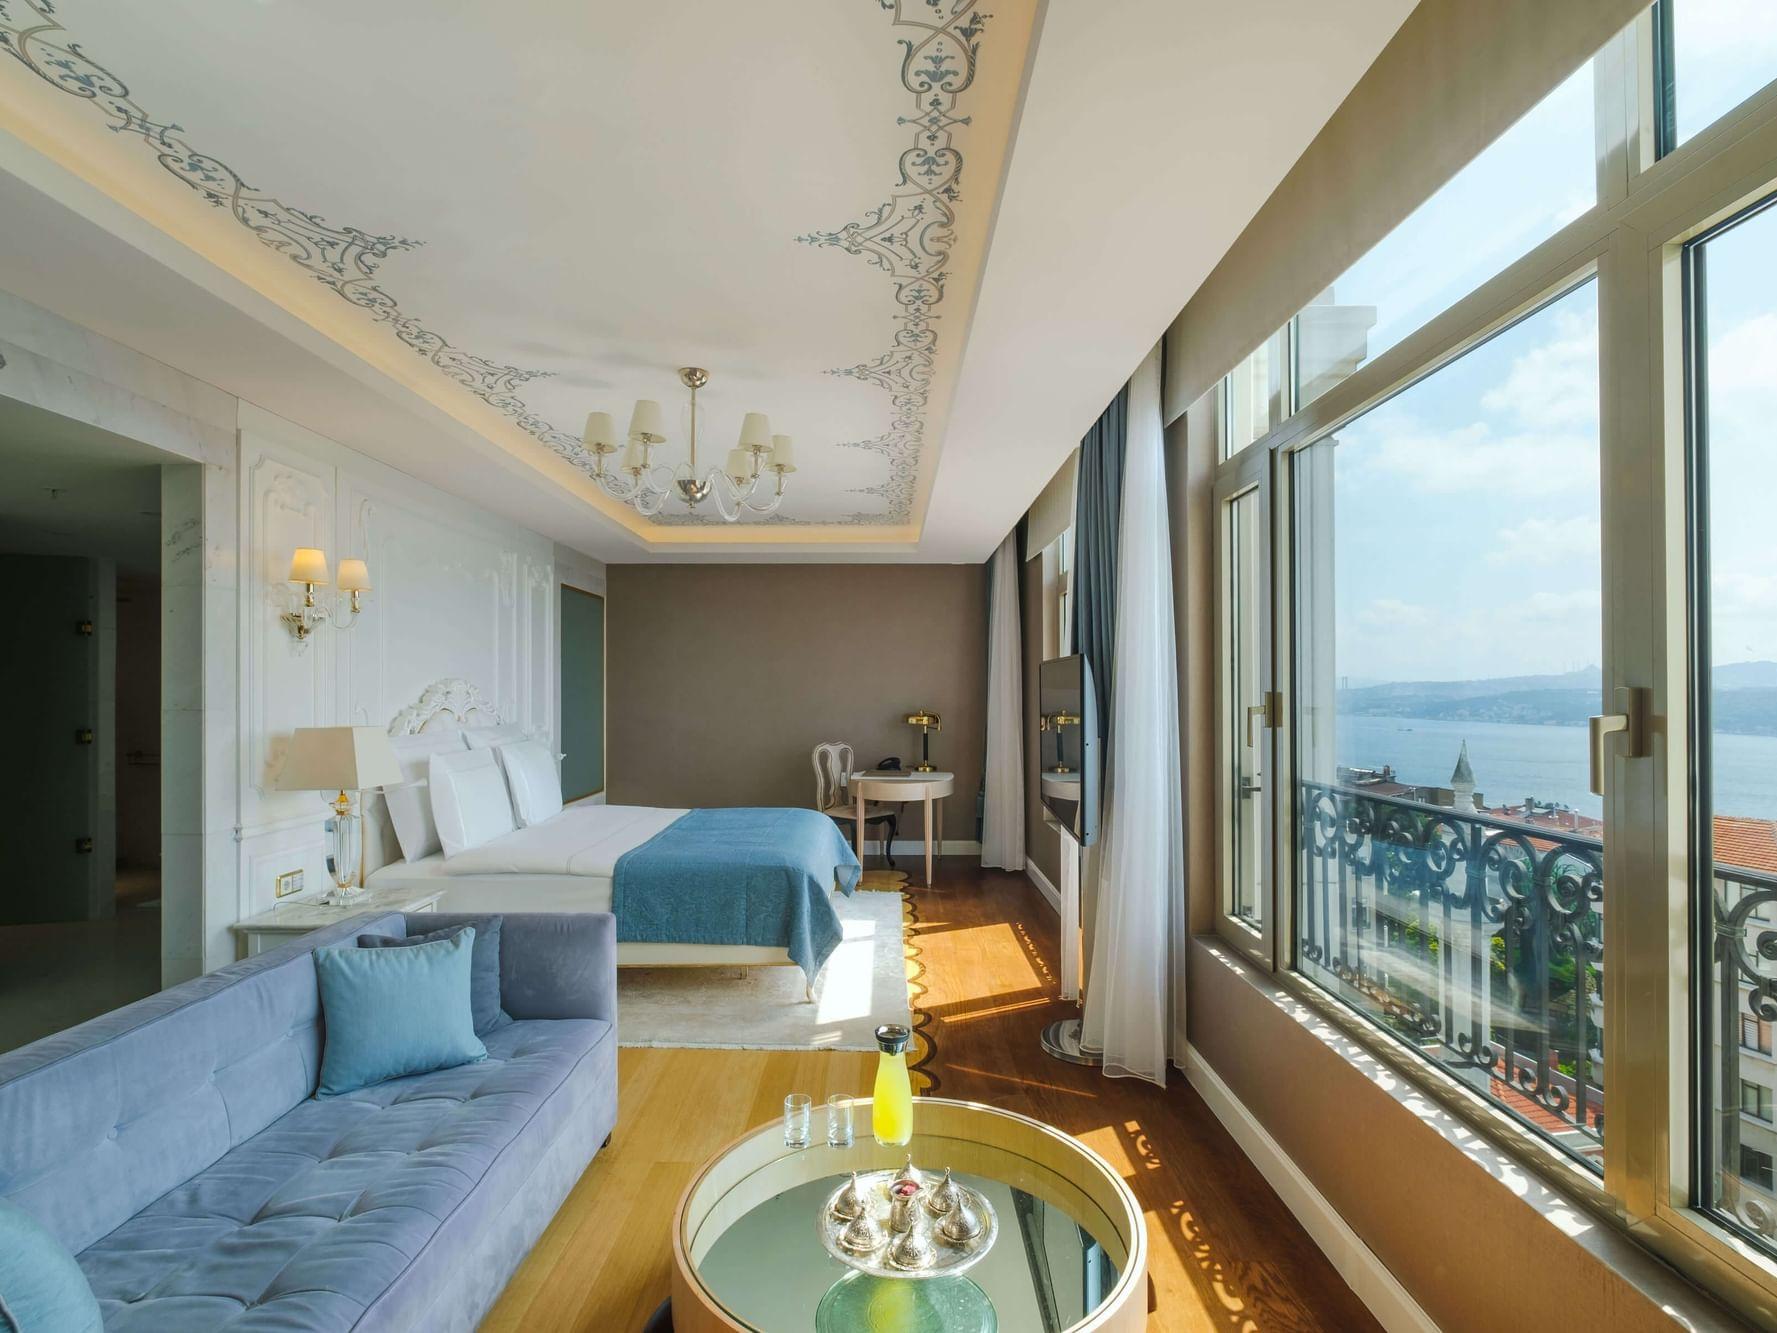 Grand Executive Bosphorus Suite CVK Park Bosphorus Hotel İstanbul